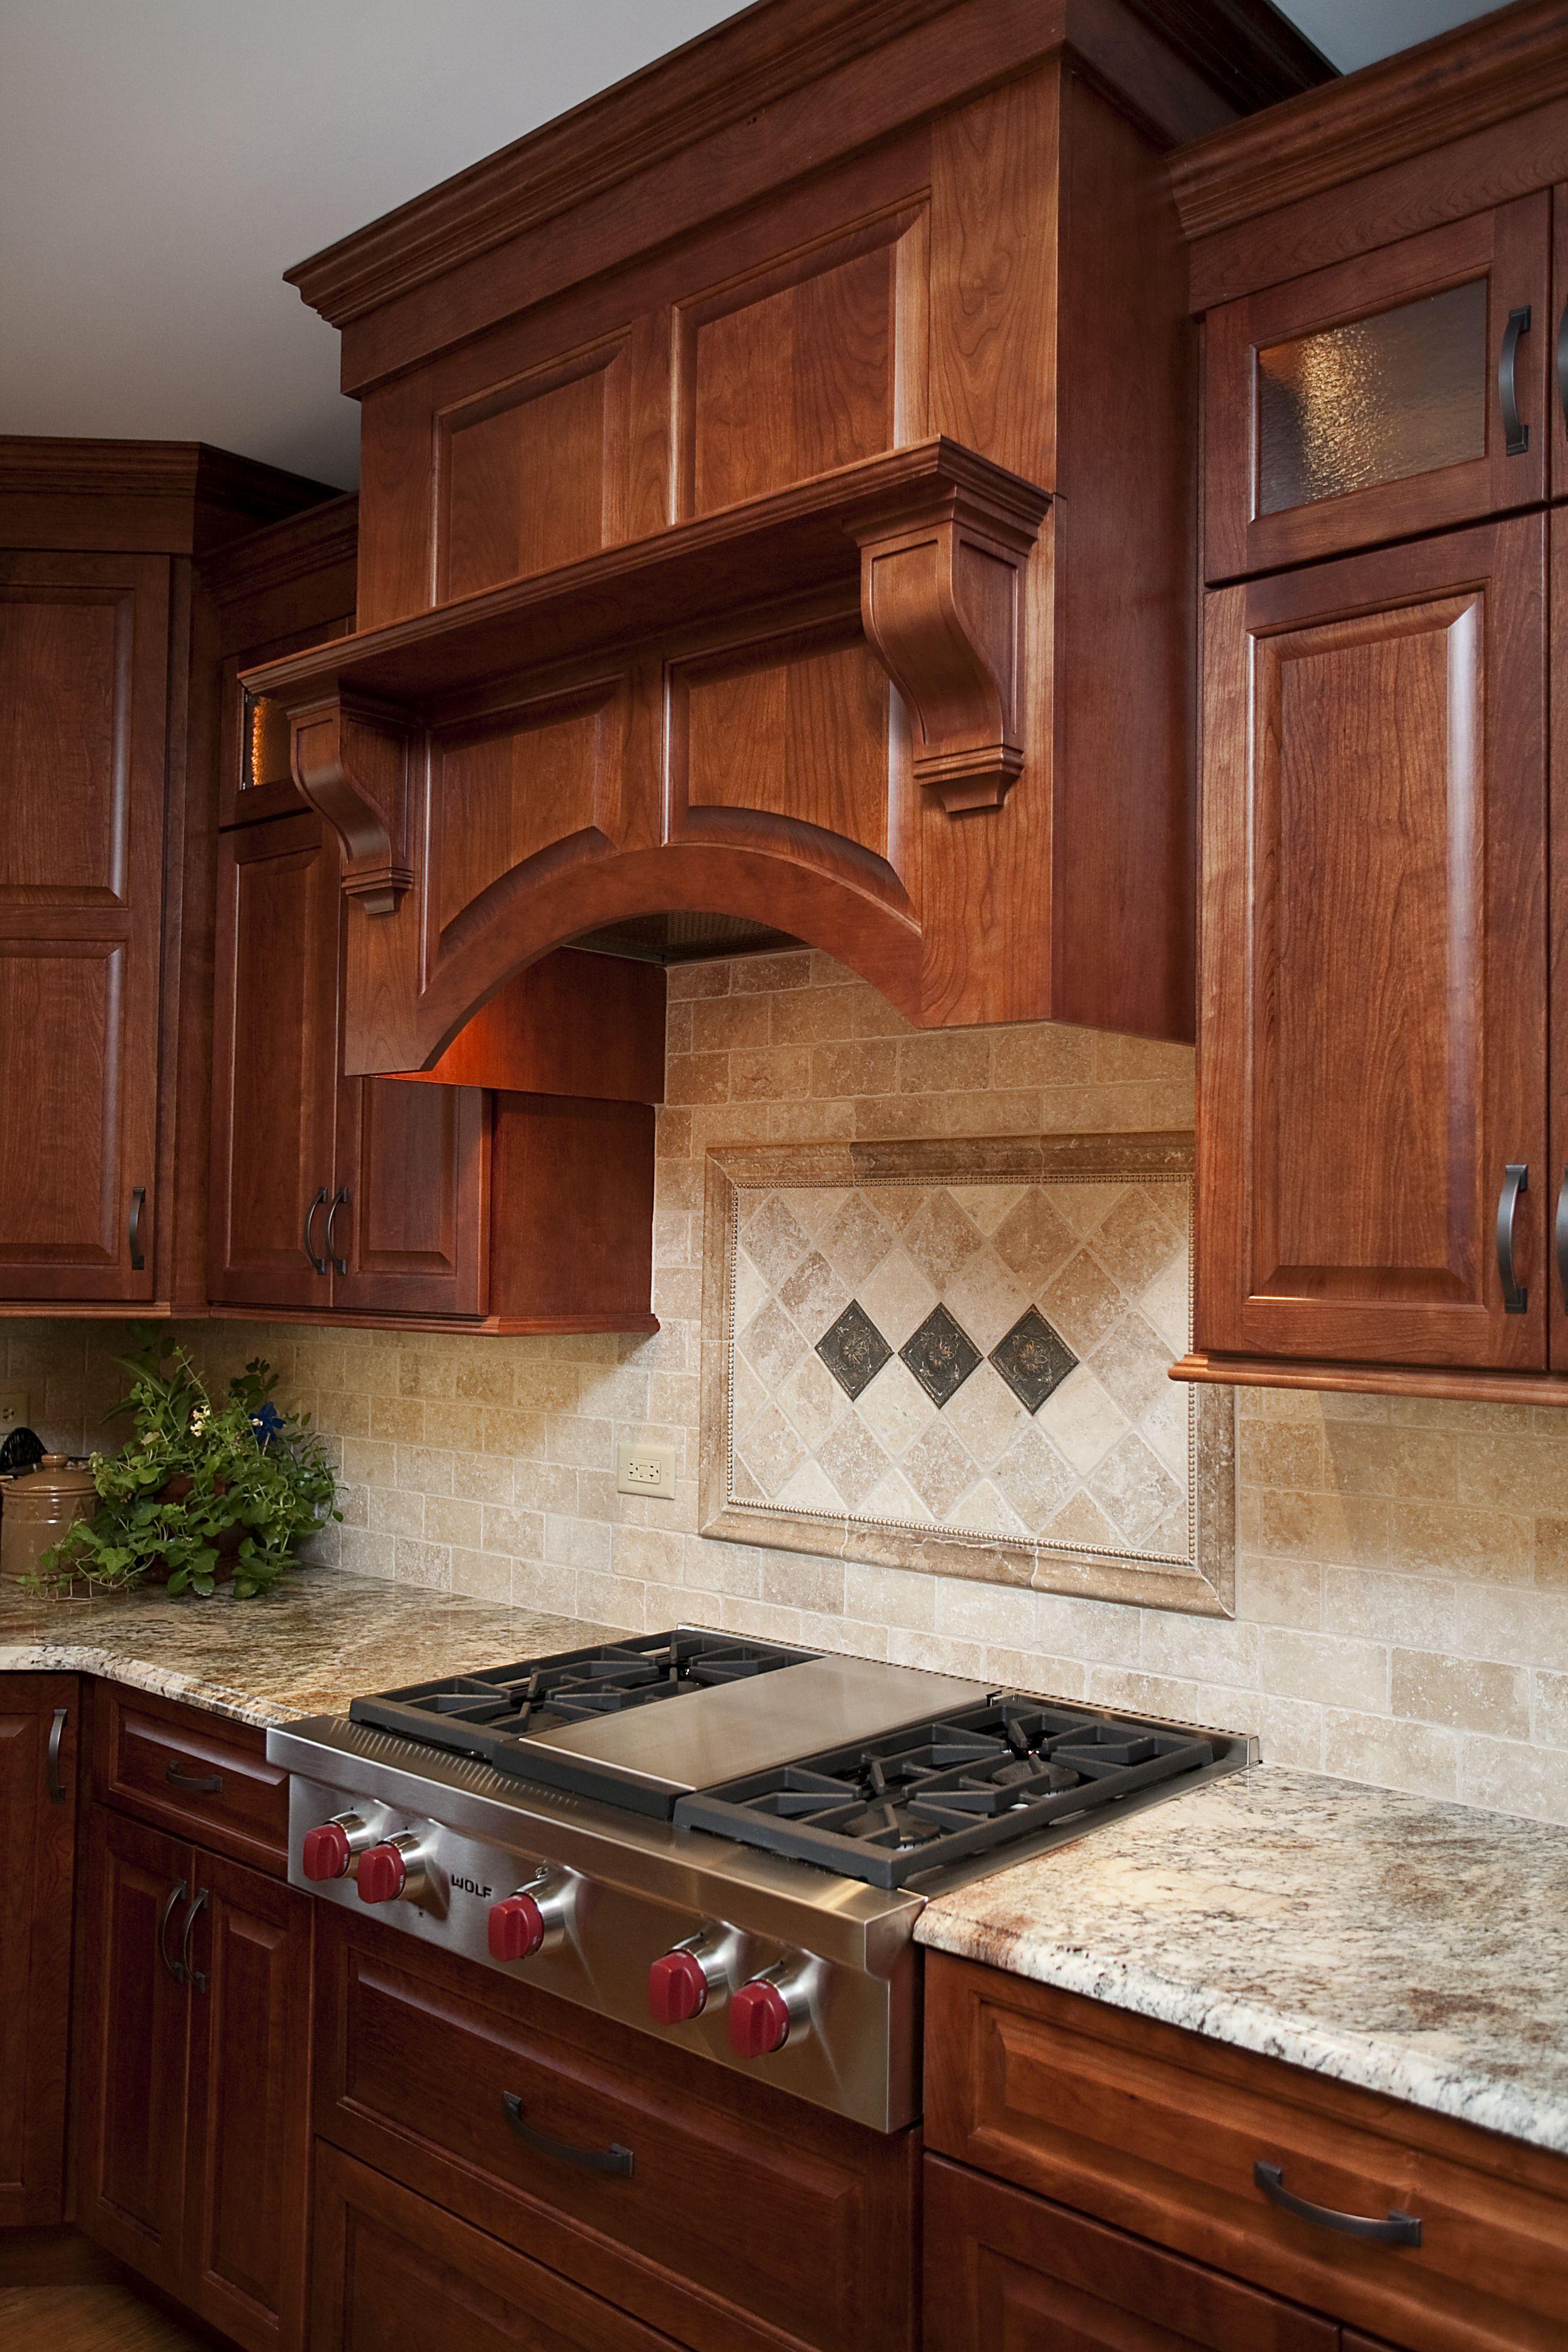 Custom Wooden Hood Cherry Cabinet In Shaker Style Cosina Cocinas